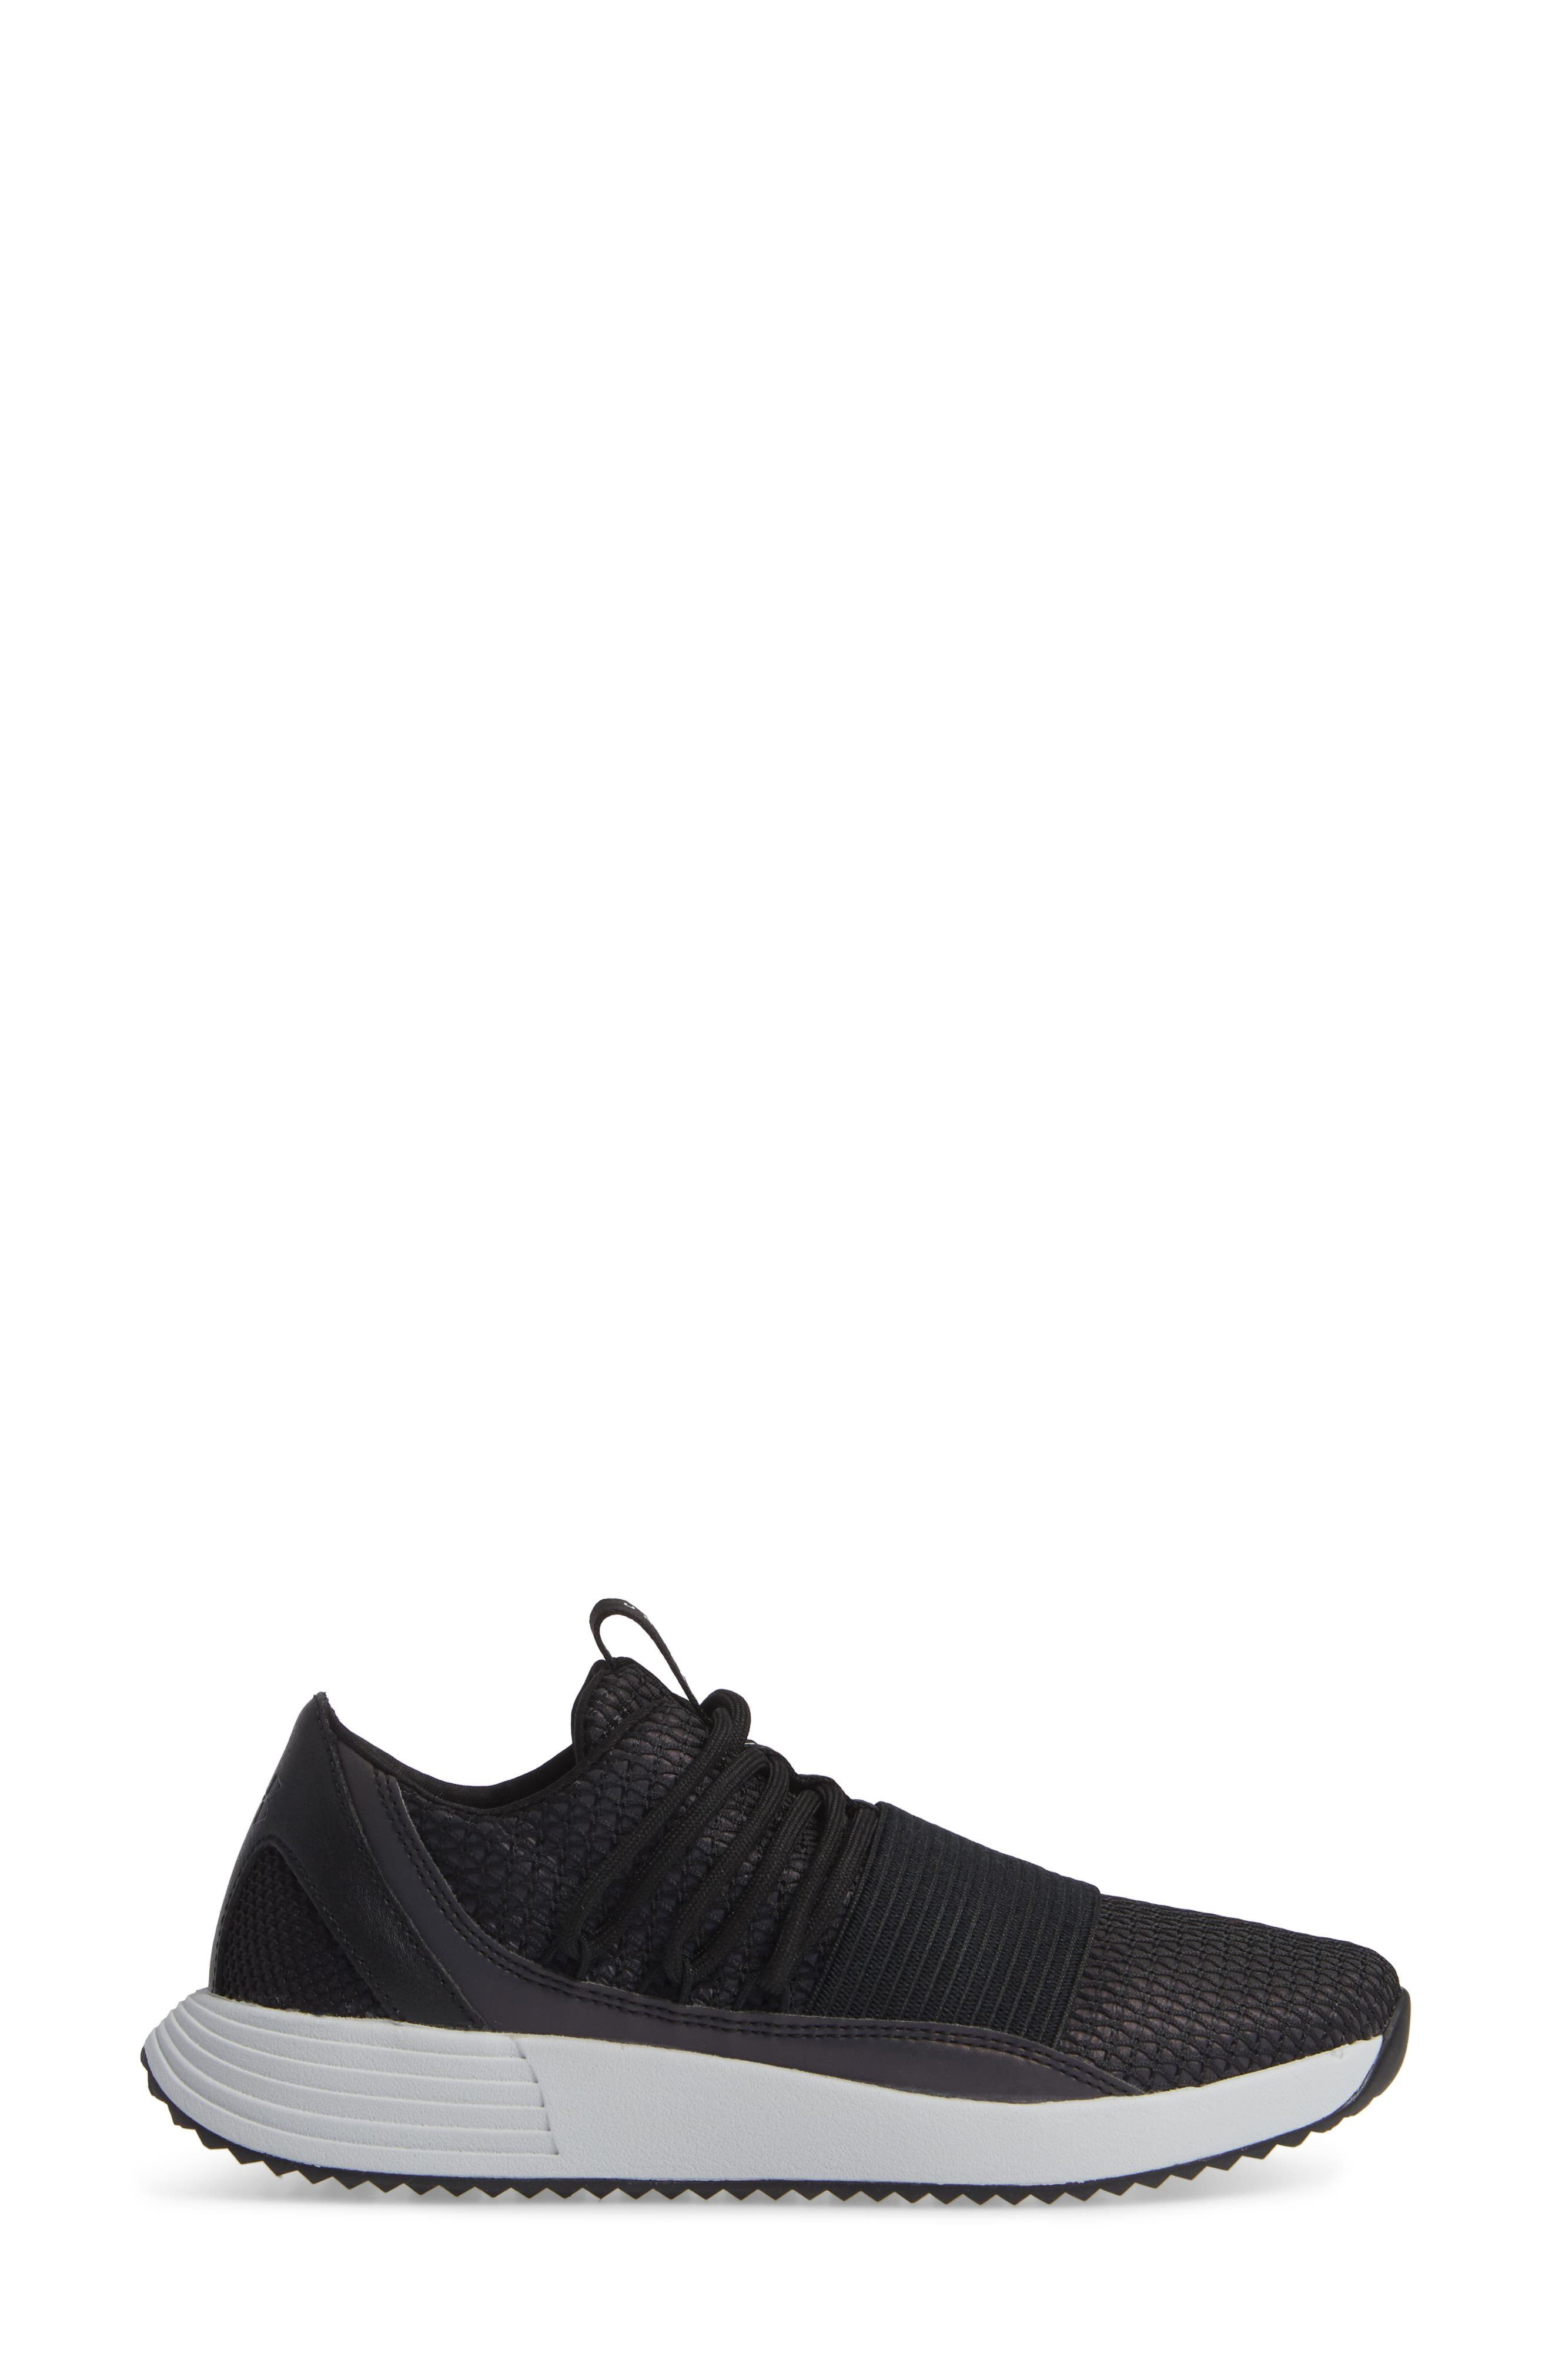 Breathe Reflective Low Top Sneaker,                             Alternate thumbnail 3, color,                             BLACK/ BLACK/ BLACK